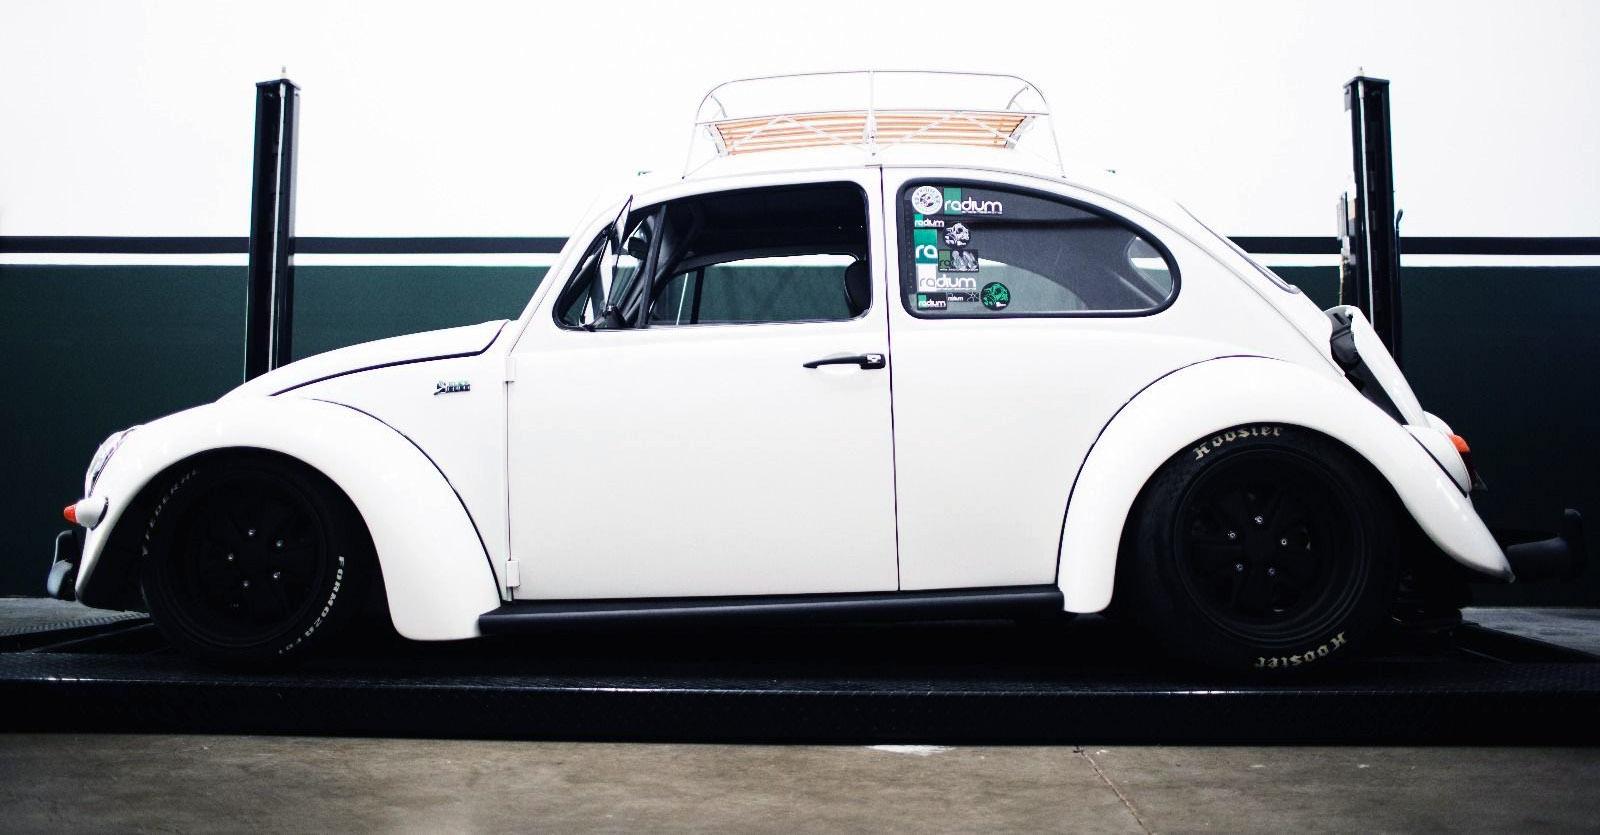 for sale 1965 vw beetle with a turbo ej25 engine swap depot. Black Bedroom Furniture Sets. Home Design Ideas